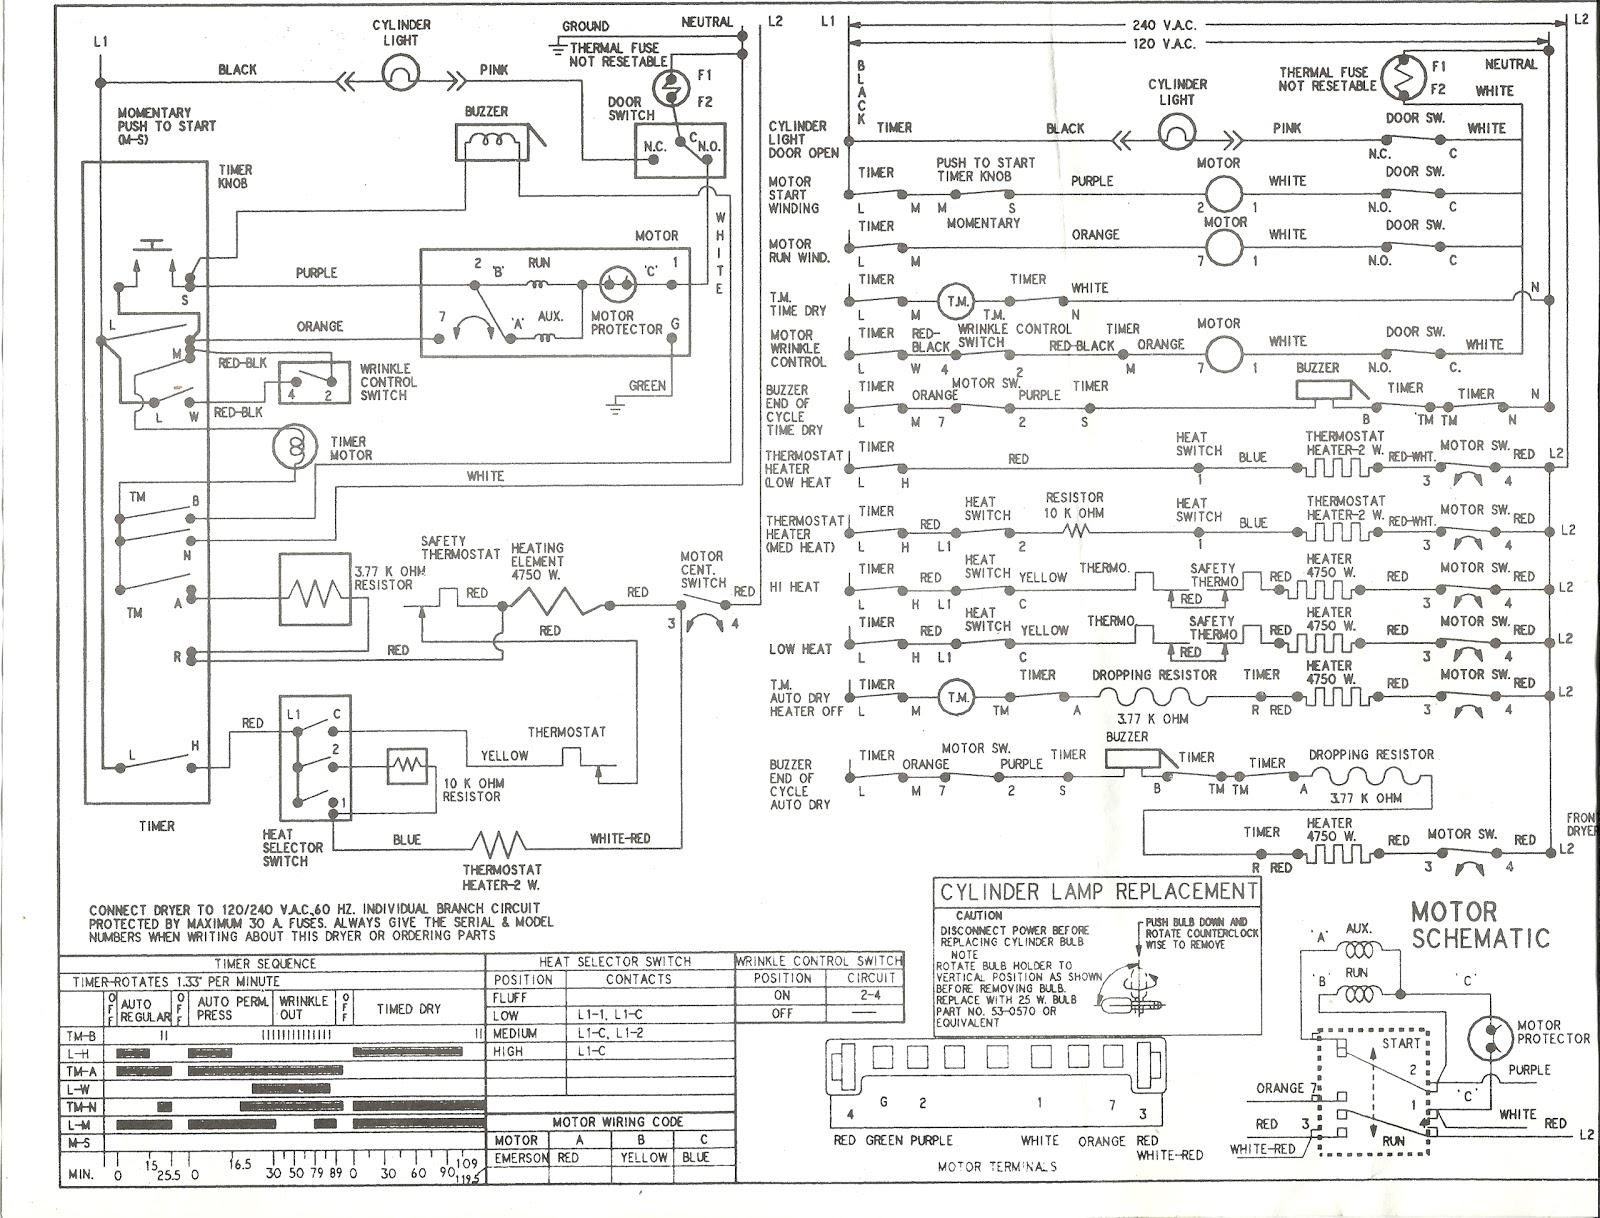 Peachy Kenmore Dishwasher Schematic Wiring Diagram Mood Wiring Cloud Domeilariaidewilluminateatxorg